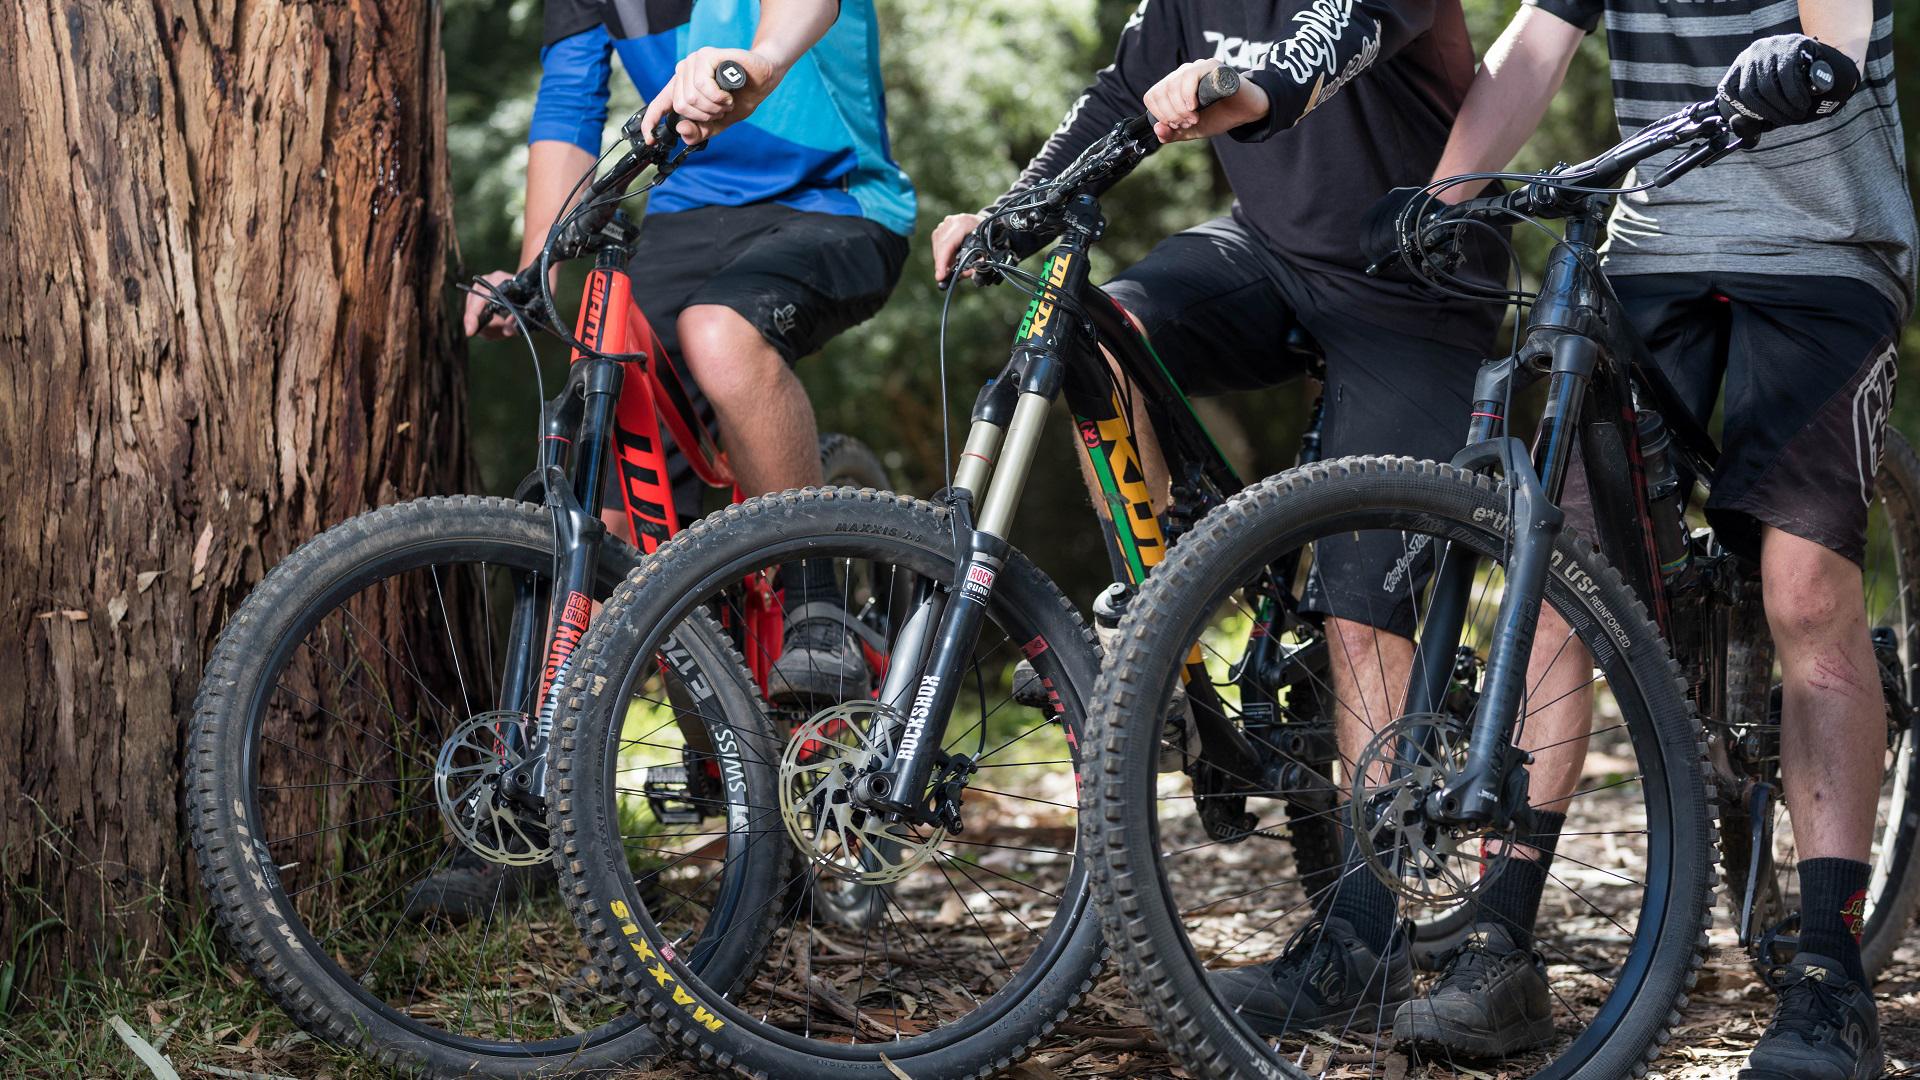 Ride Yarra Ranges - Mountain bike riders at Warburton Community for Consultation